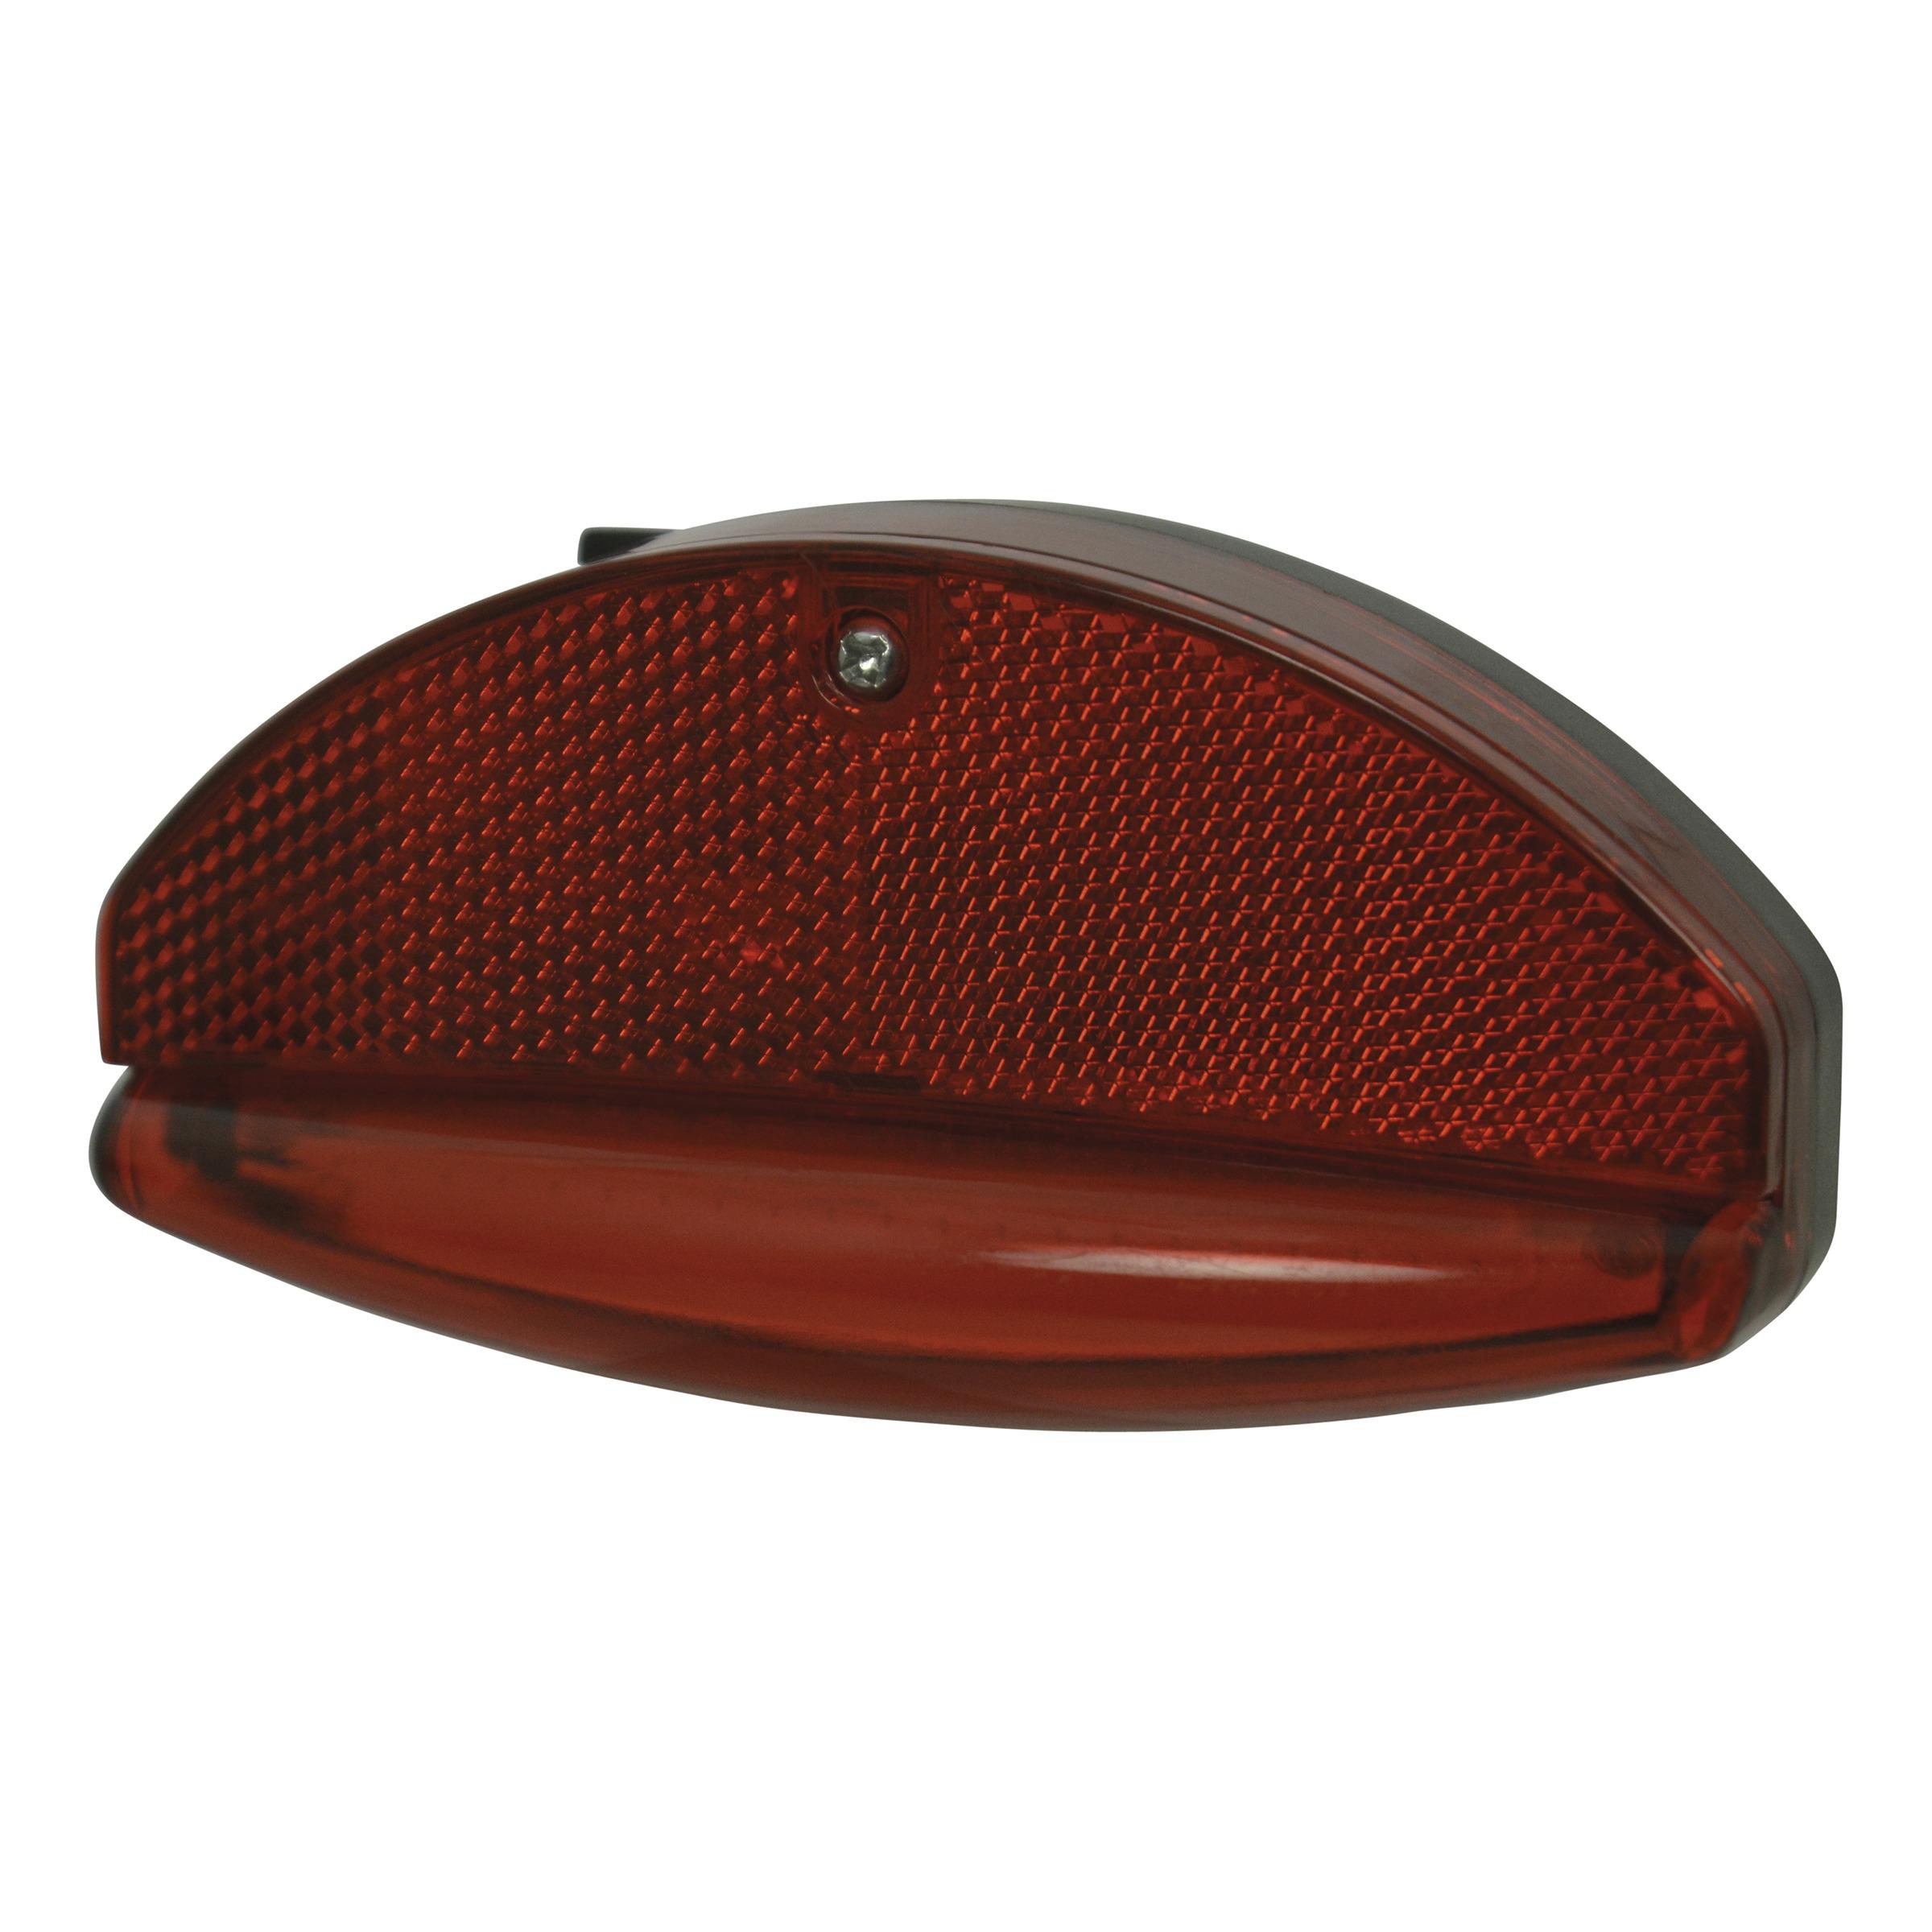 Dresco Achterlicht COB LED